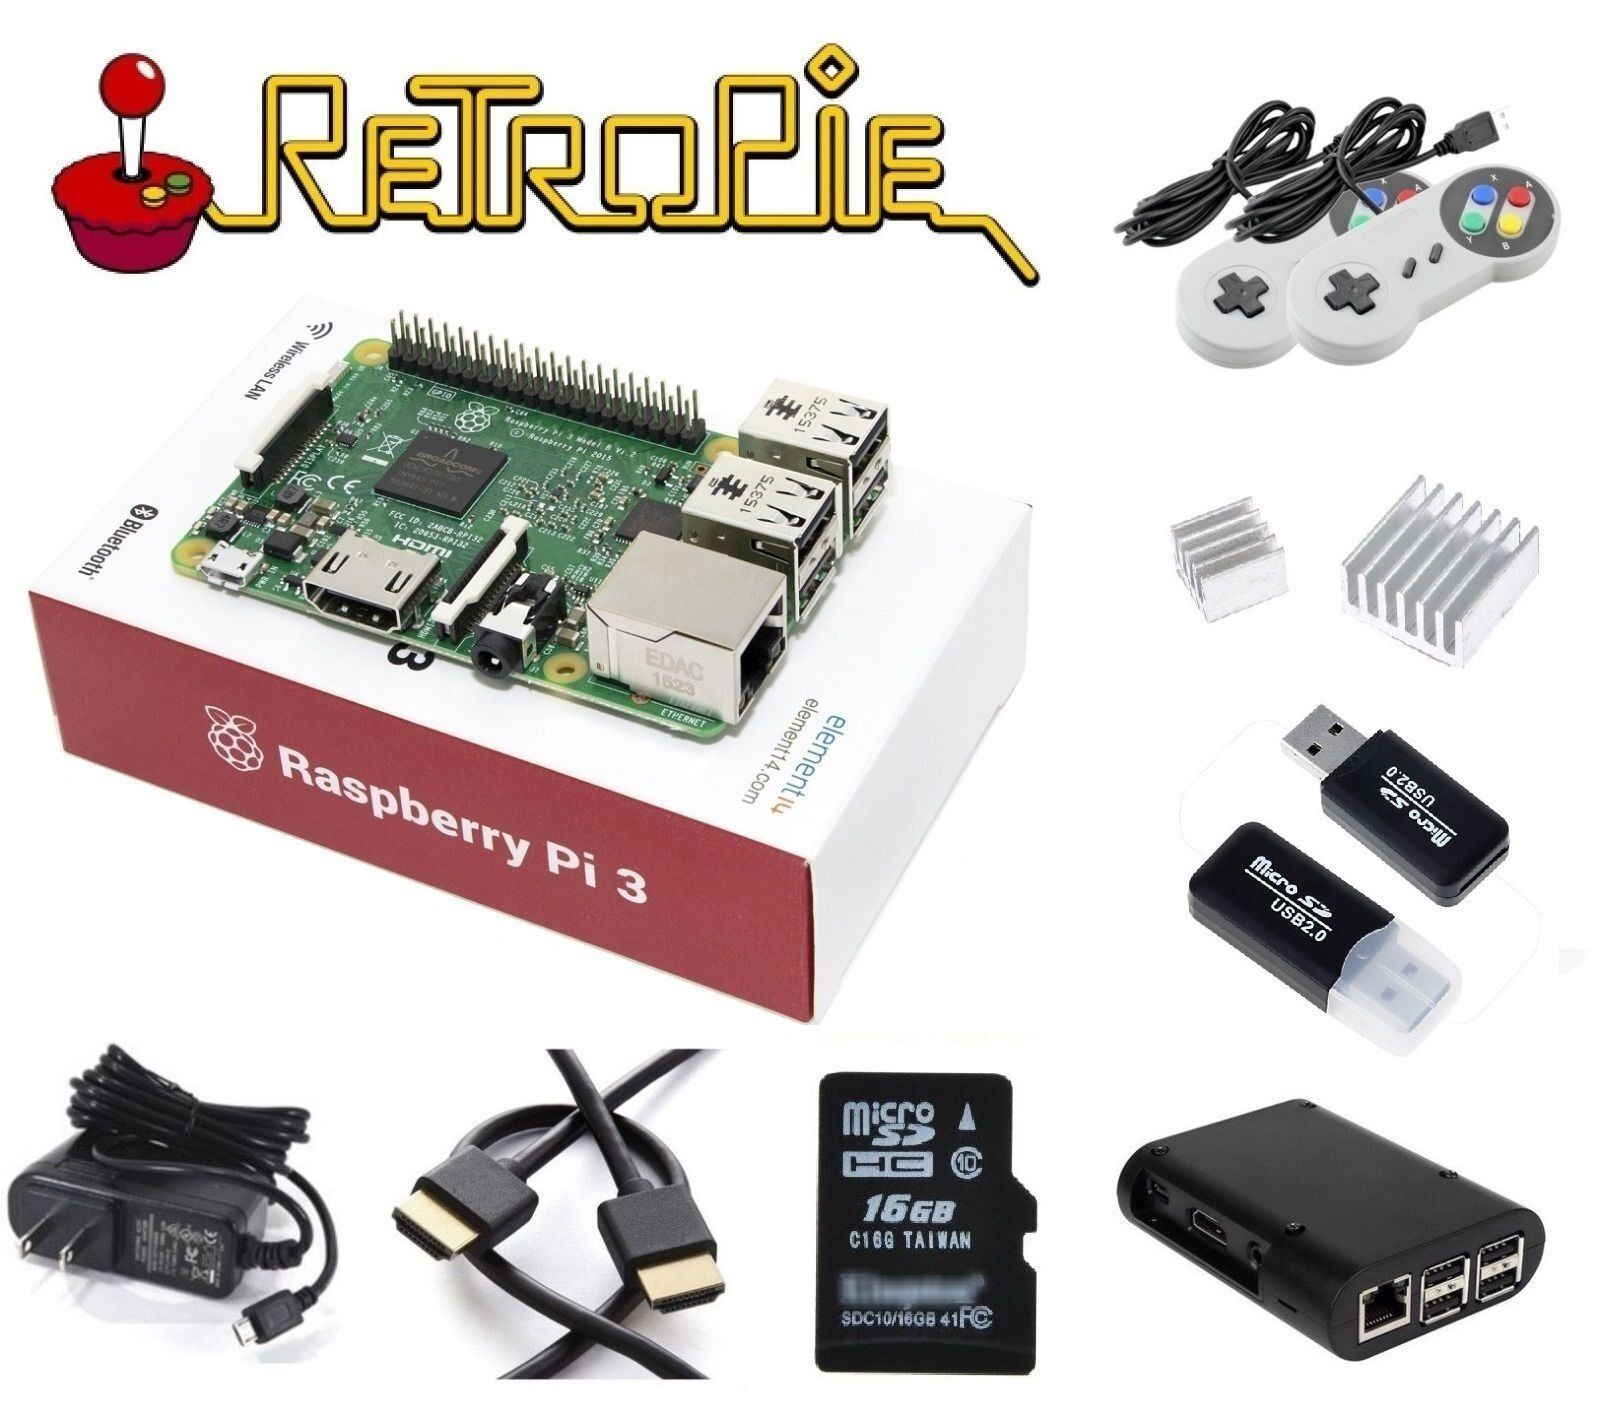 RASPBERRY PI 3 Model B RetroPie Game Console Kit, 2 Controle